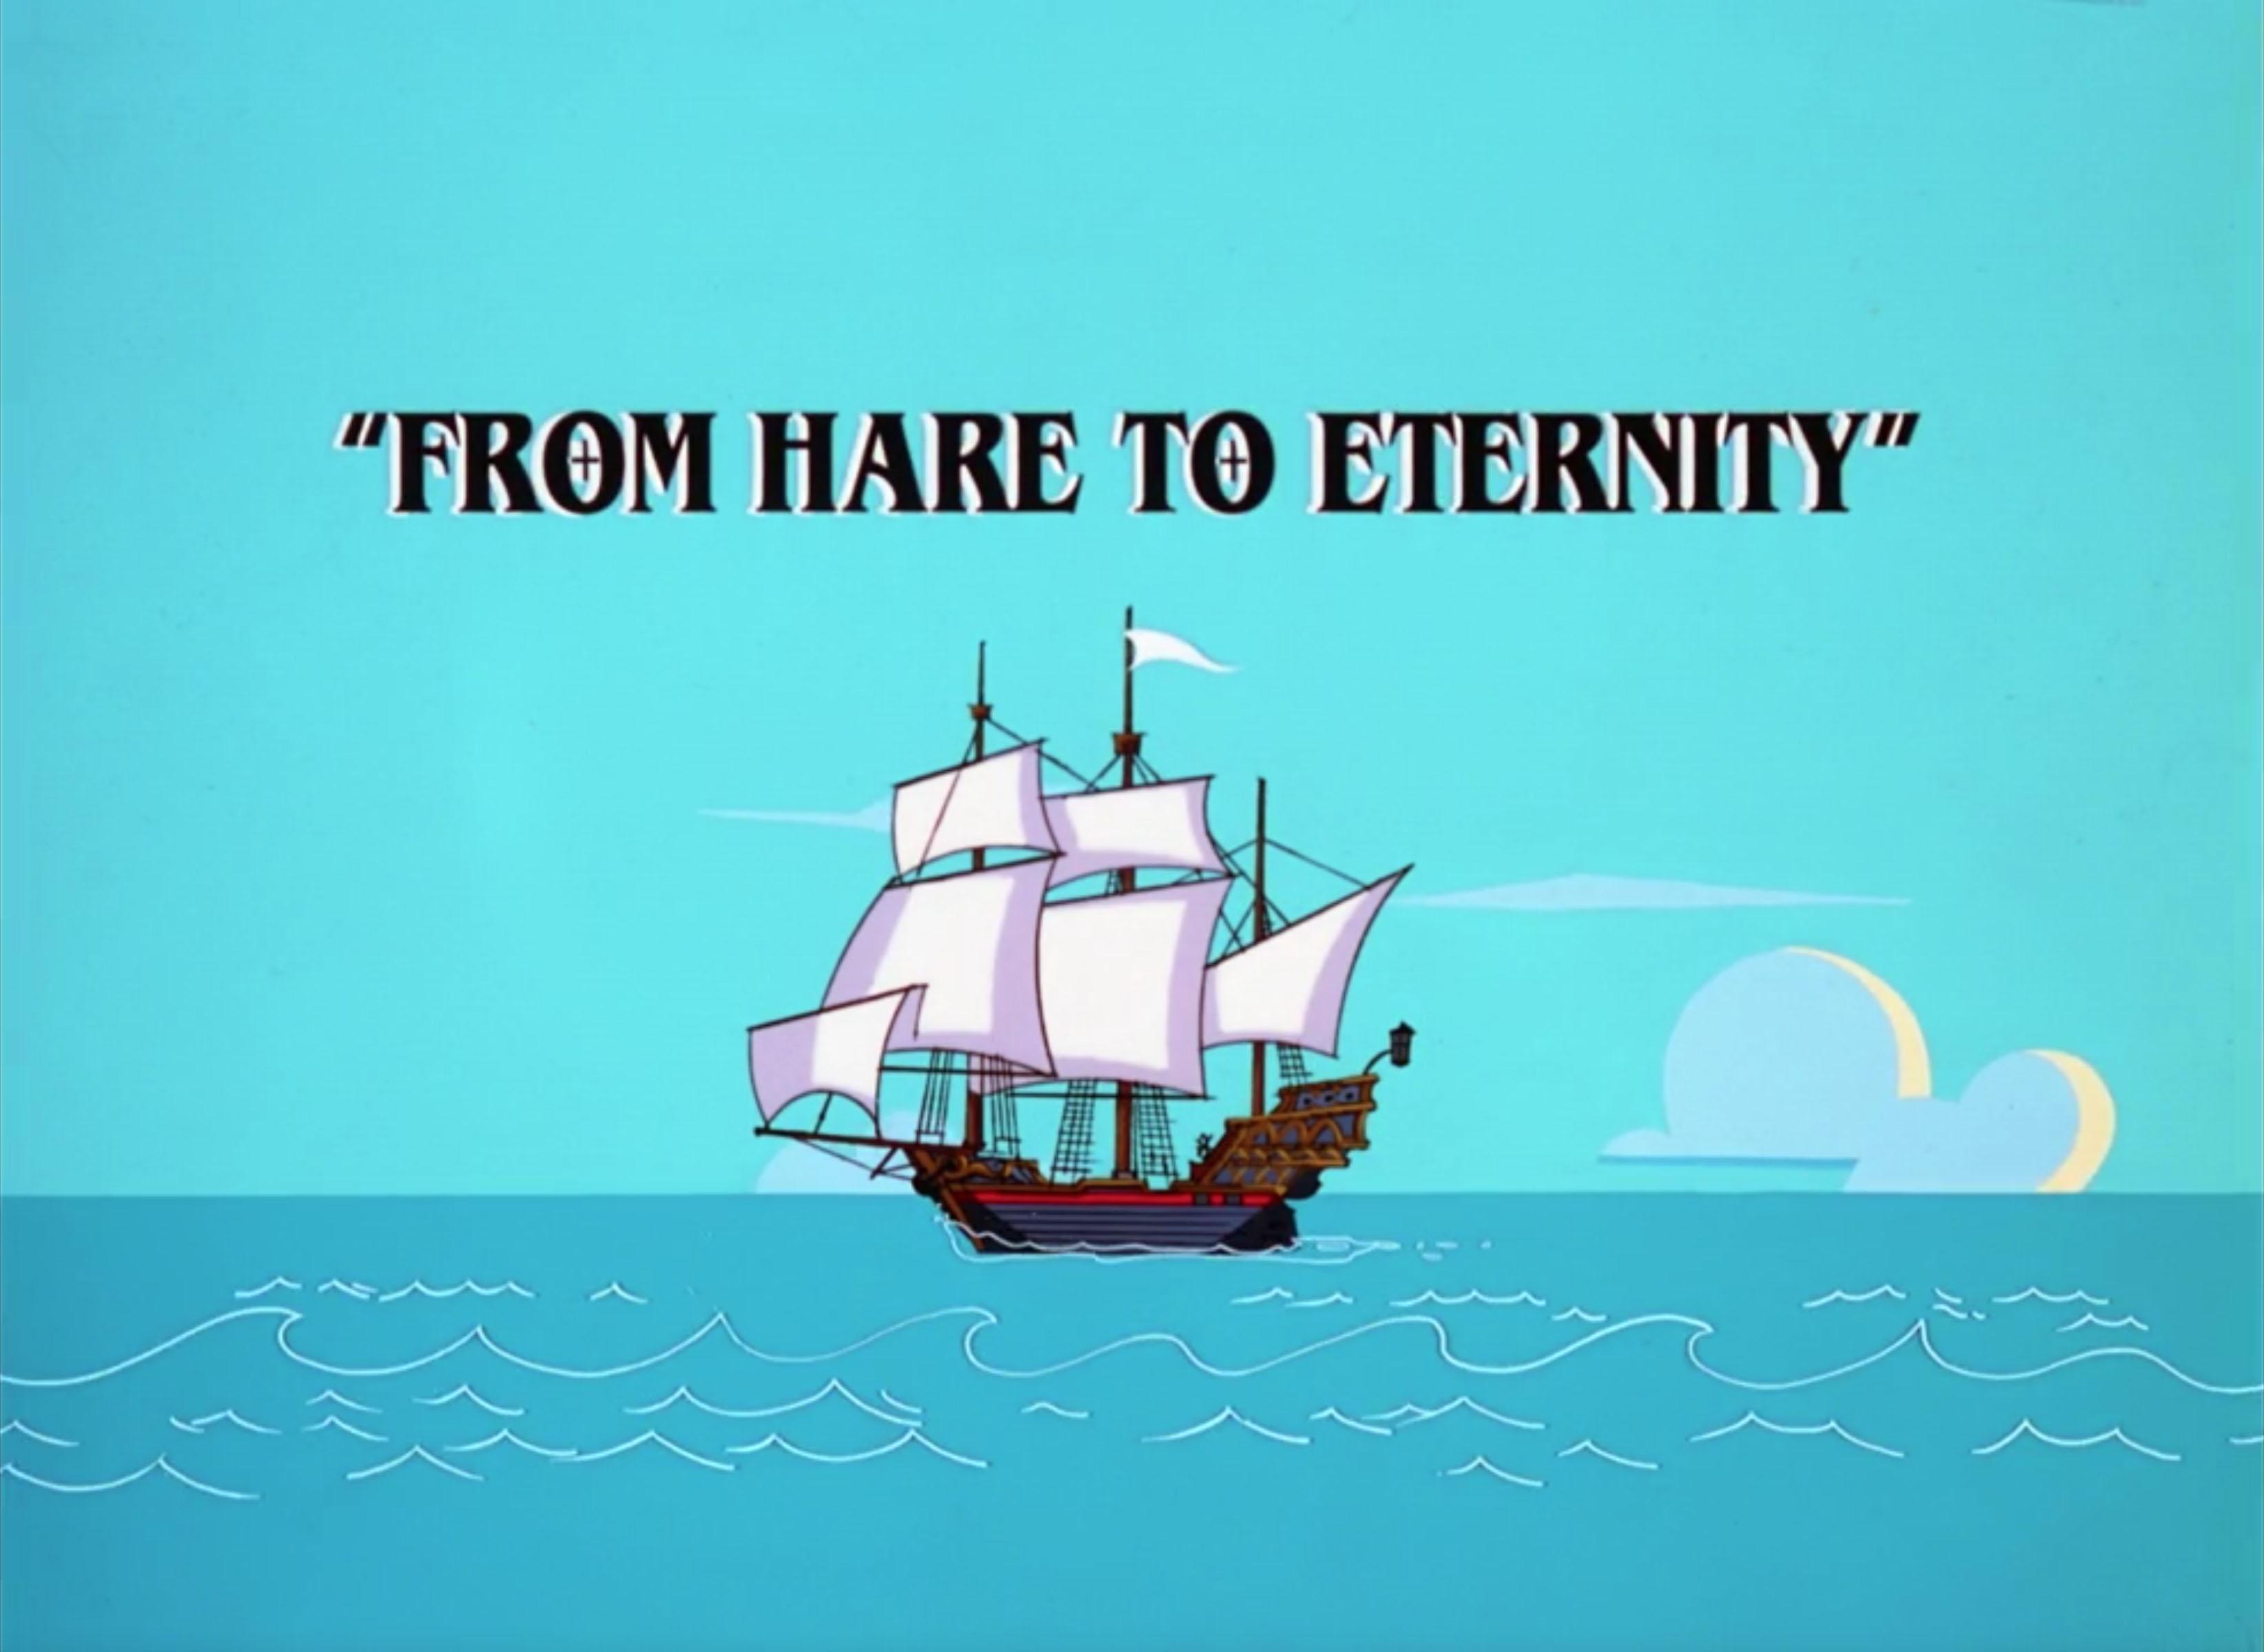 File:Hare eternity.jpg